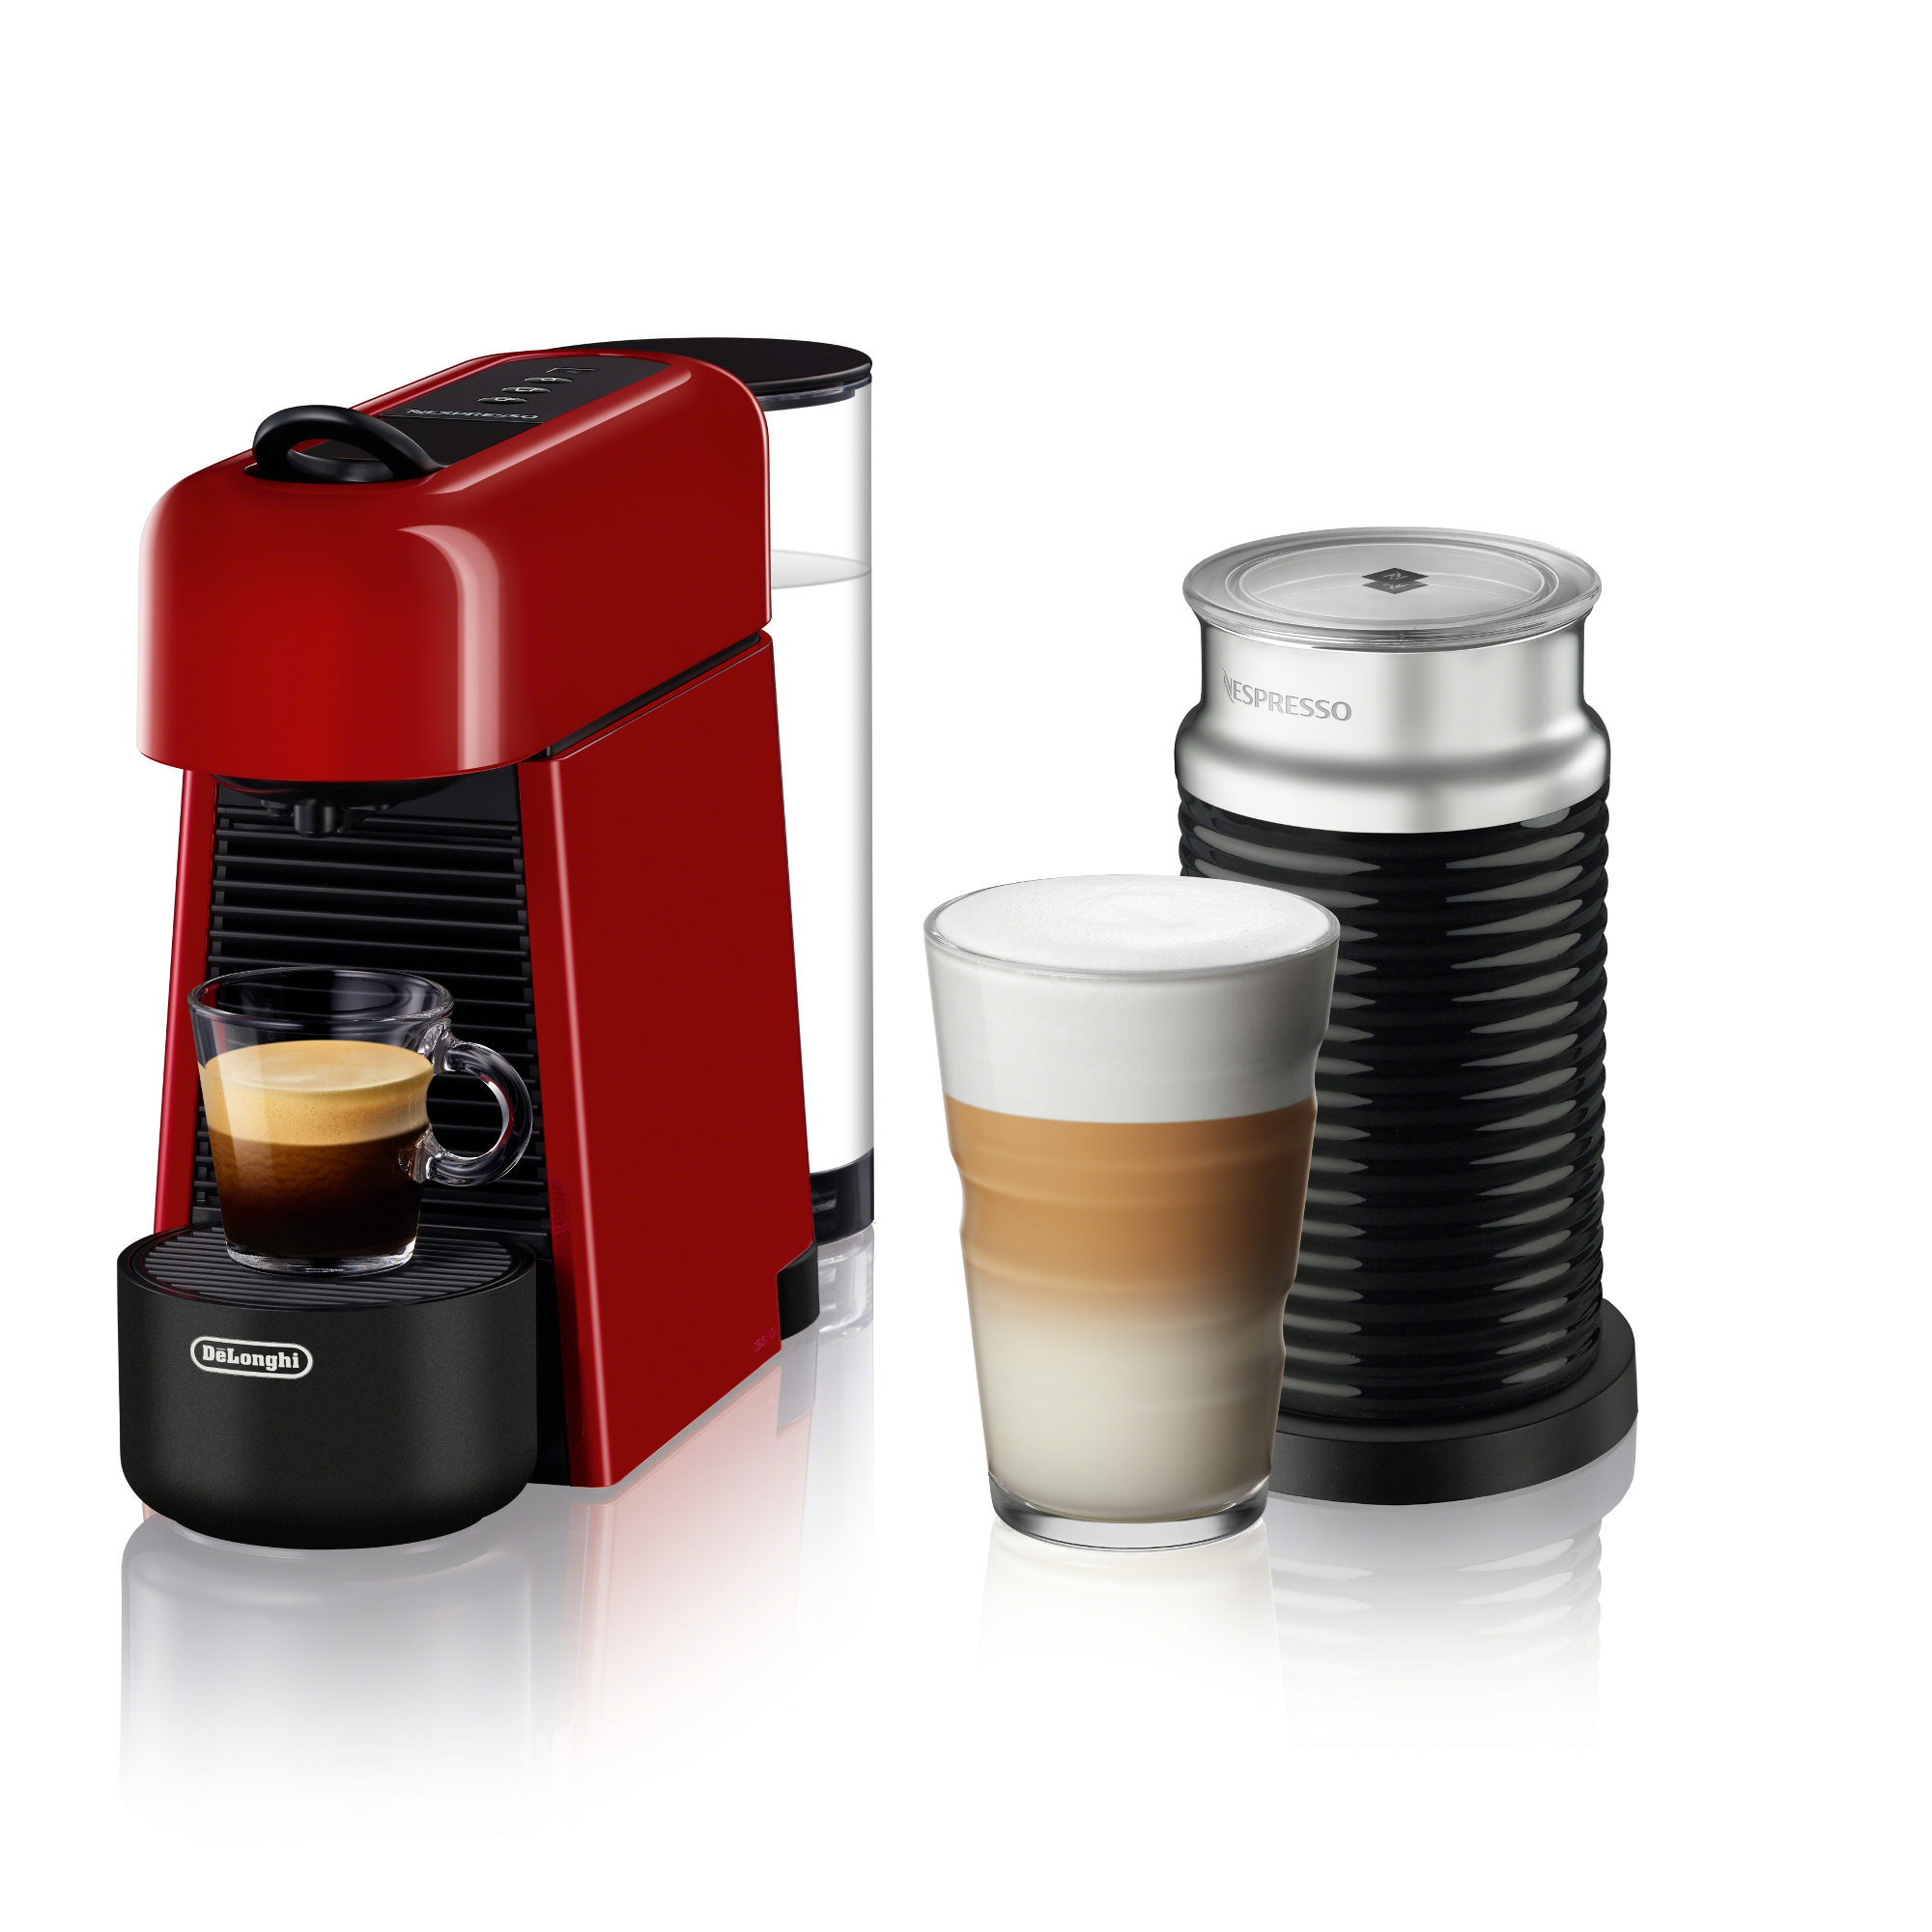 De'Longhi Nespresso Essenza Plus Red Espresso Machine with Aeroccino